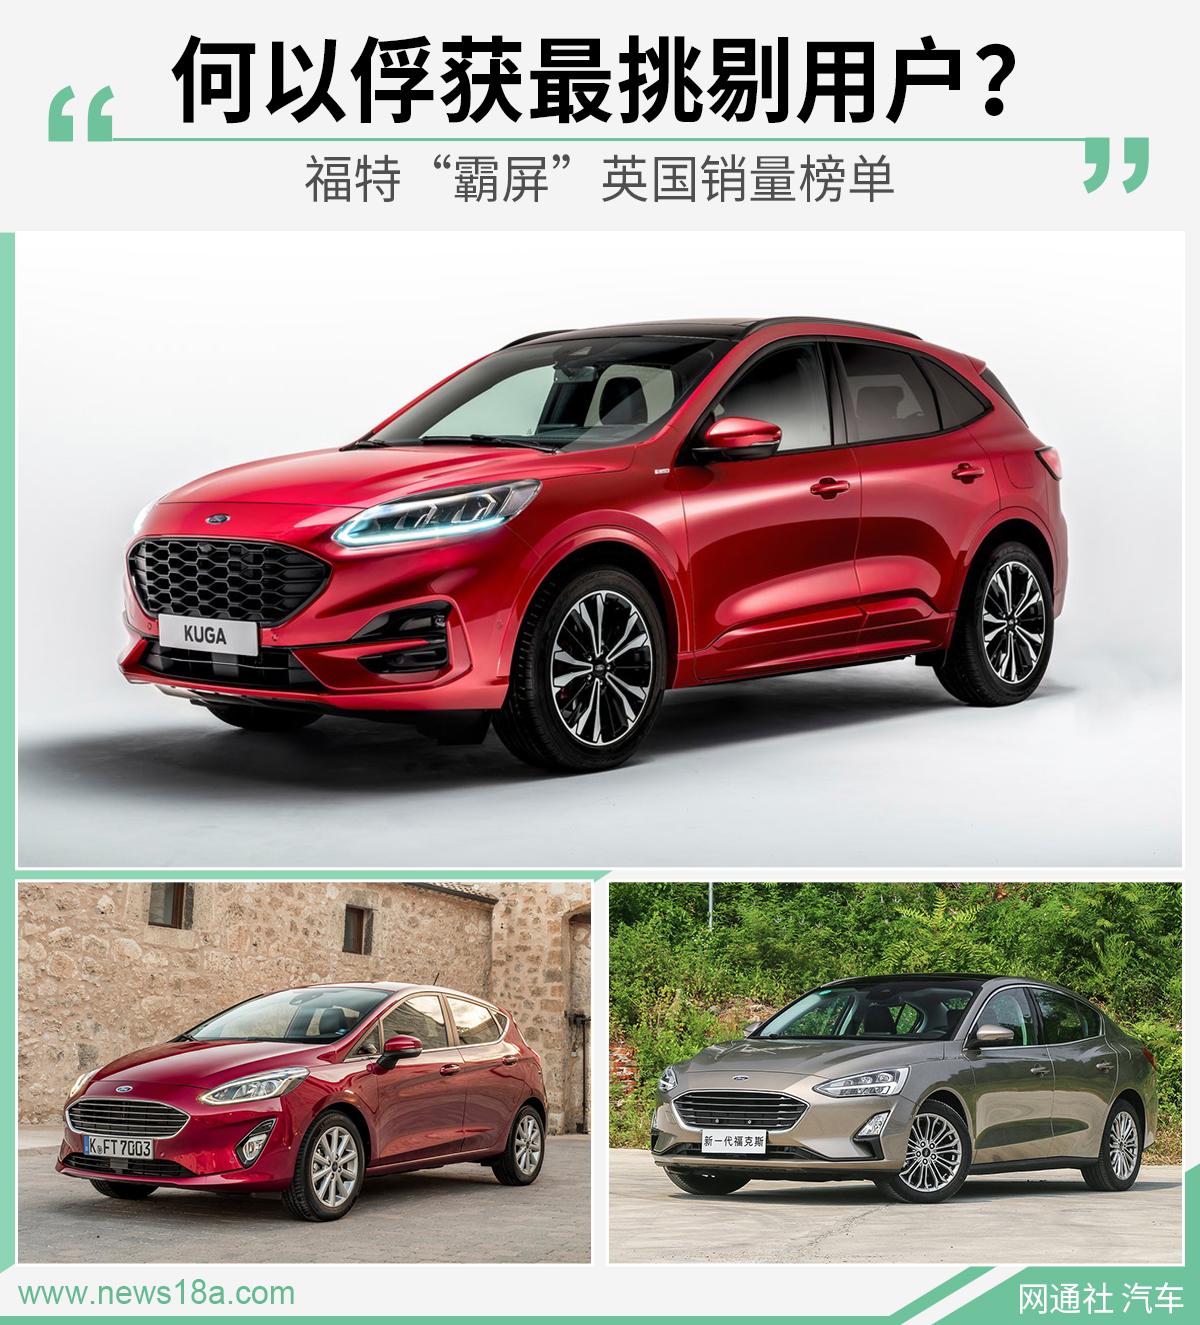 http://www.weixinrensheng.com/qichekong/1478762.html